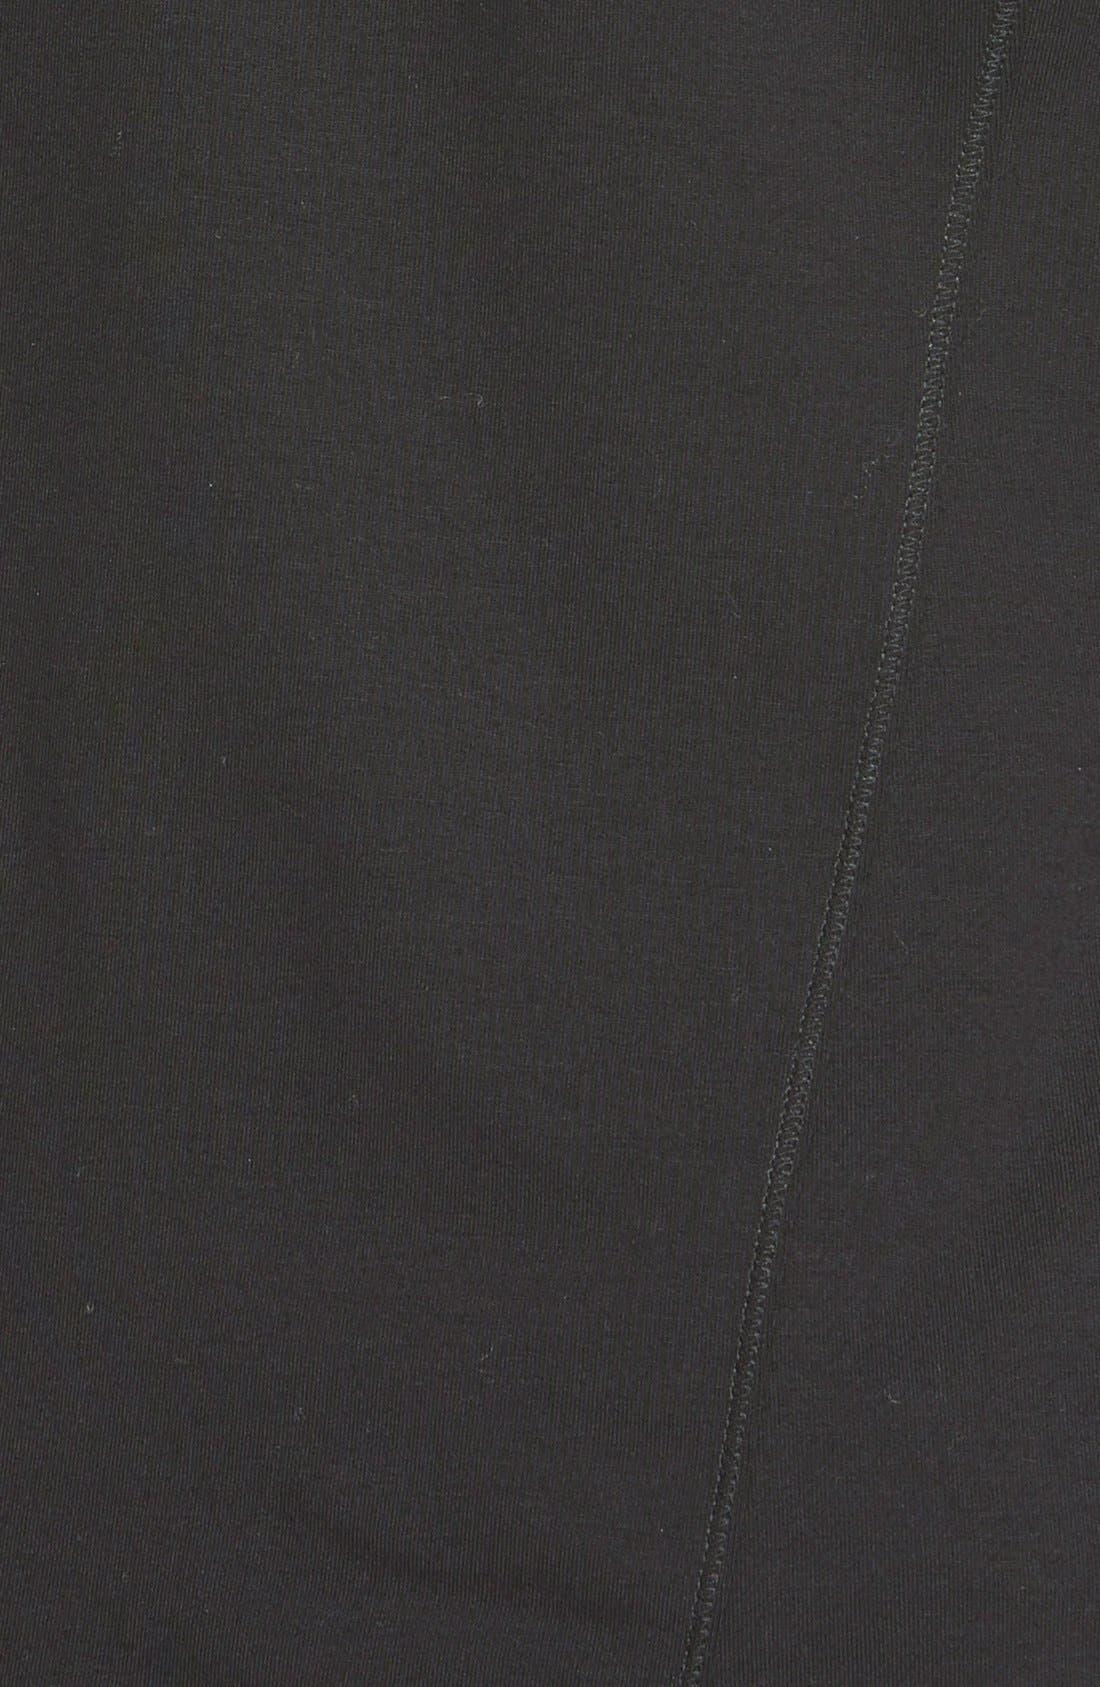 Alternate Image 3  - Eileen Fisher Mixed Organic Cotton Stretch Knit Jacket